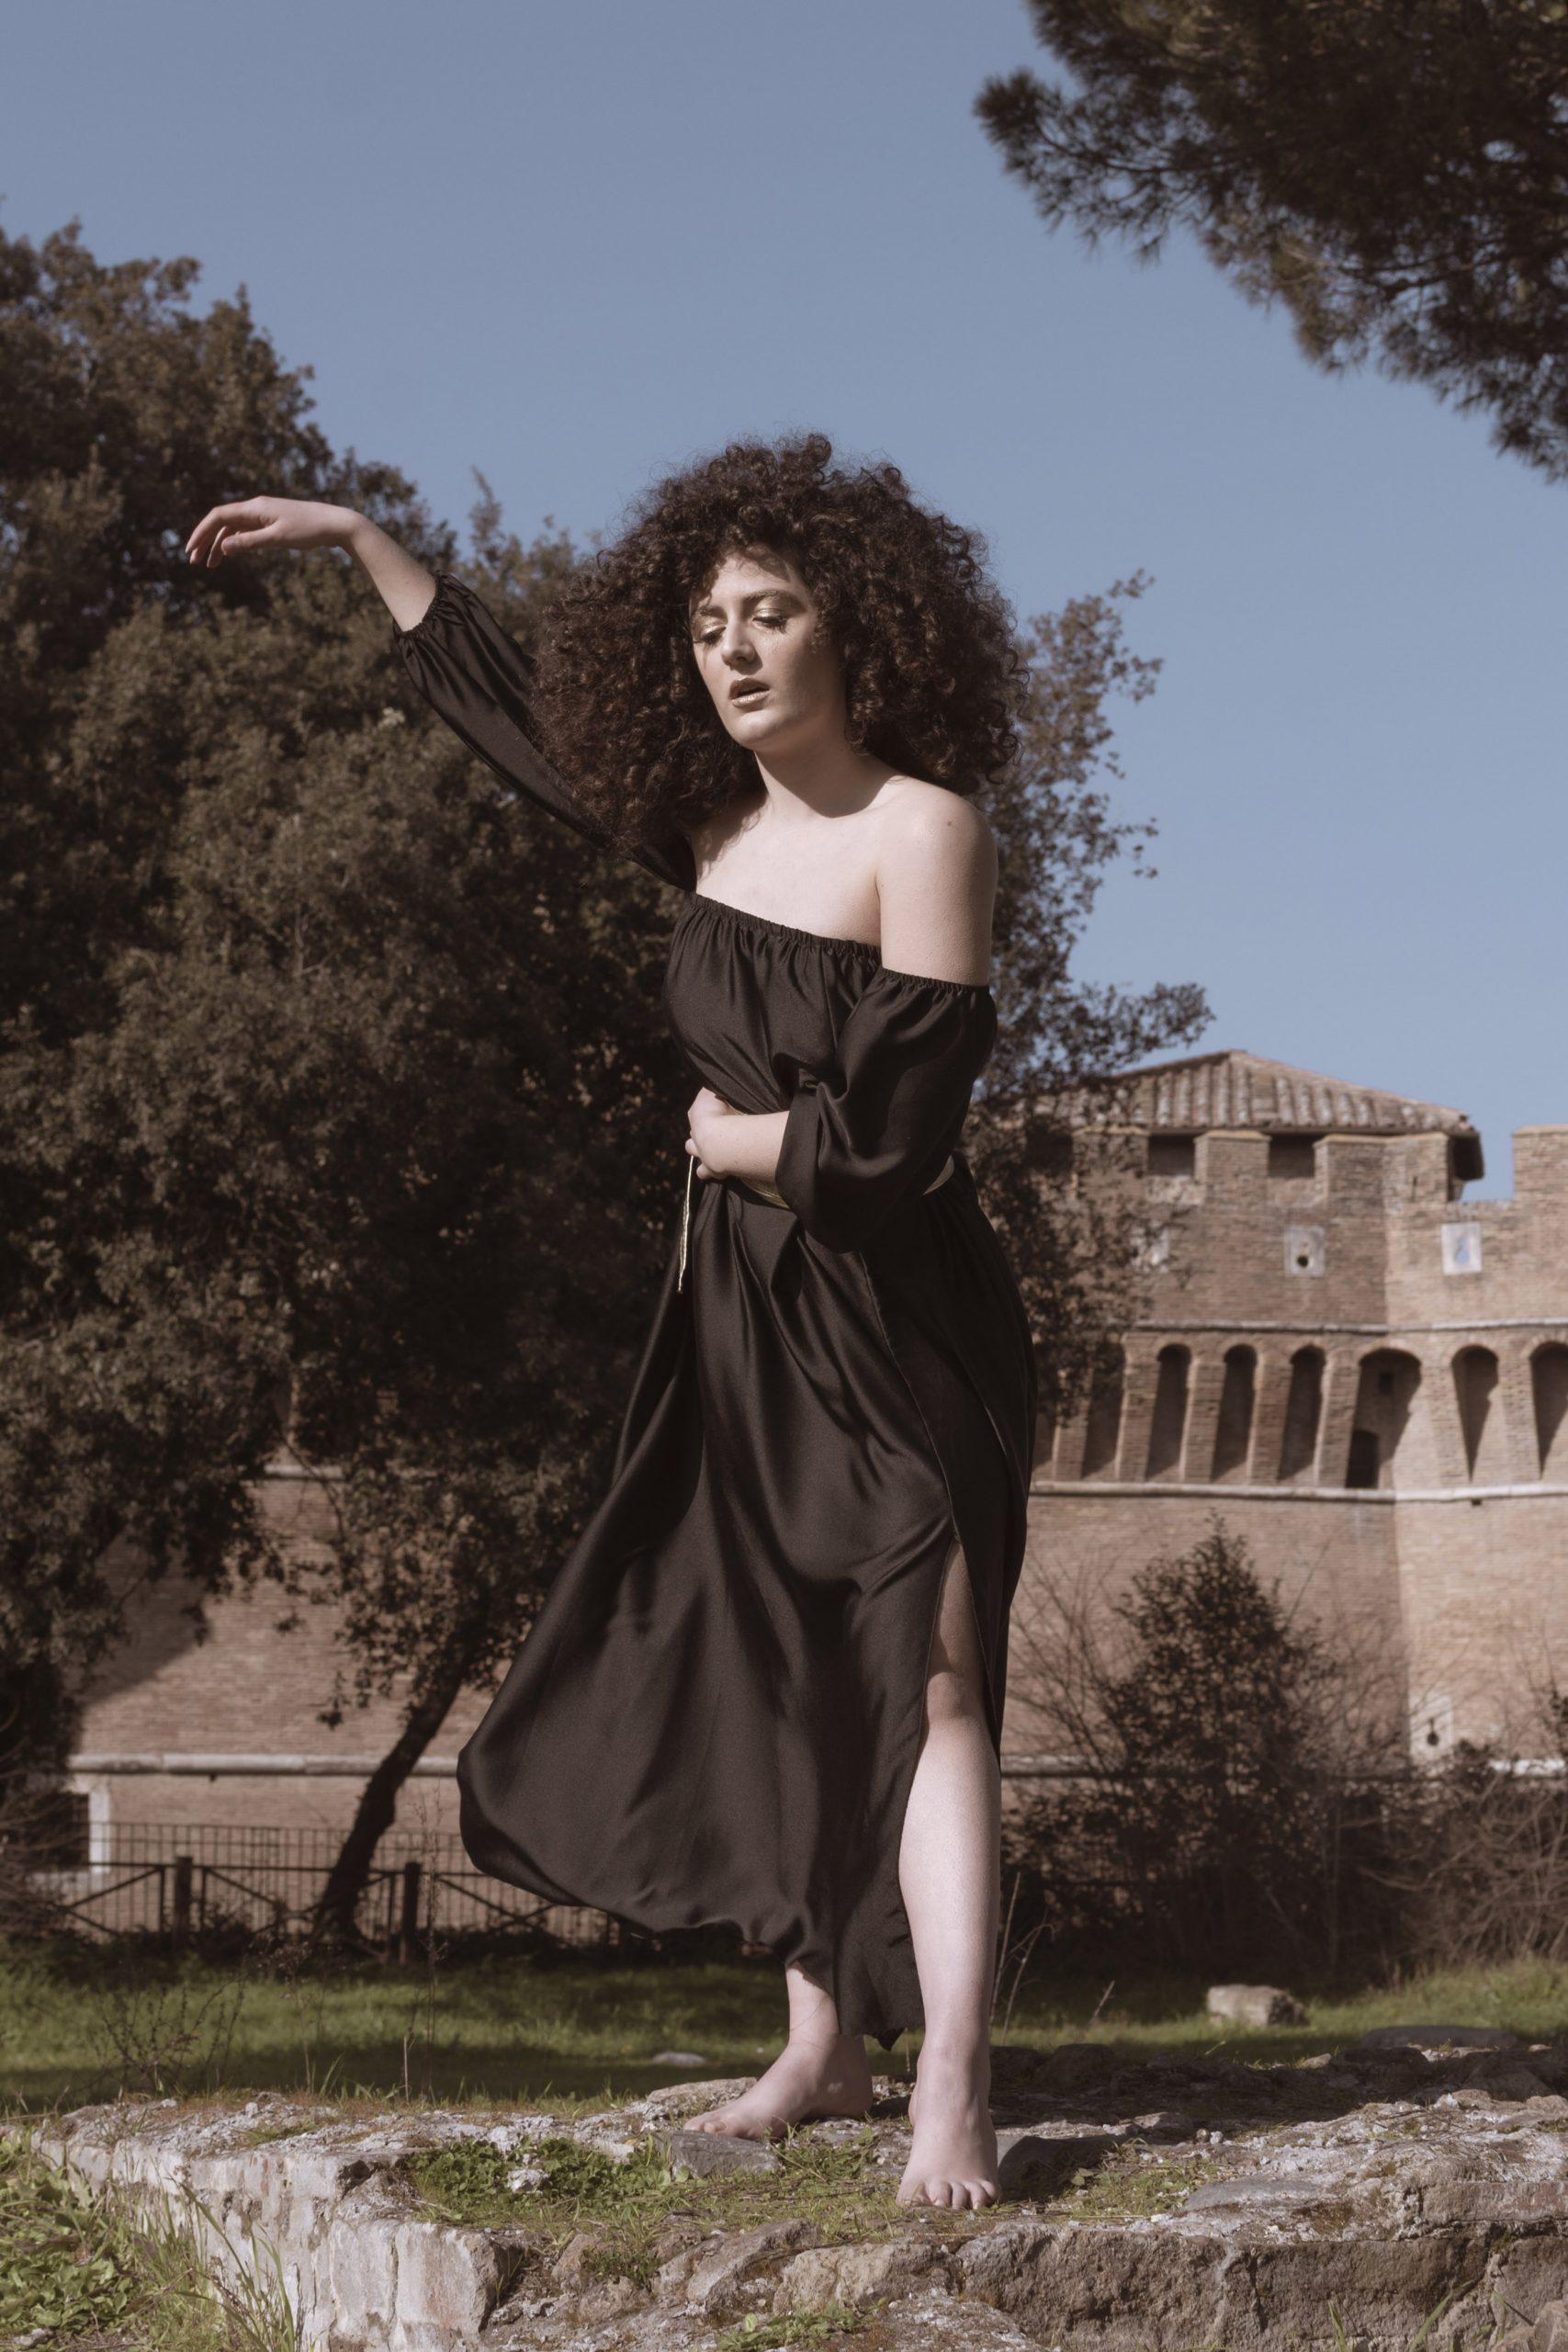 Categorie: Glamour, Fine Art; Ph: LAURA AURIZZI; Model: FABIOLA MENDOLIA; Mua: EMILIA BAKA; Location: Ostia Antica, RM, Italia